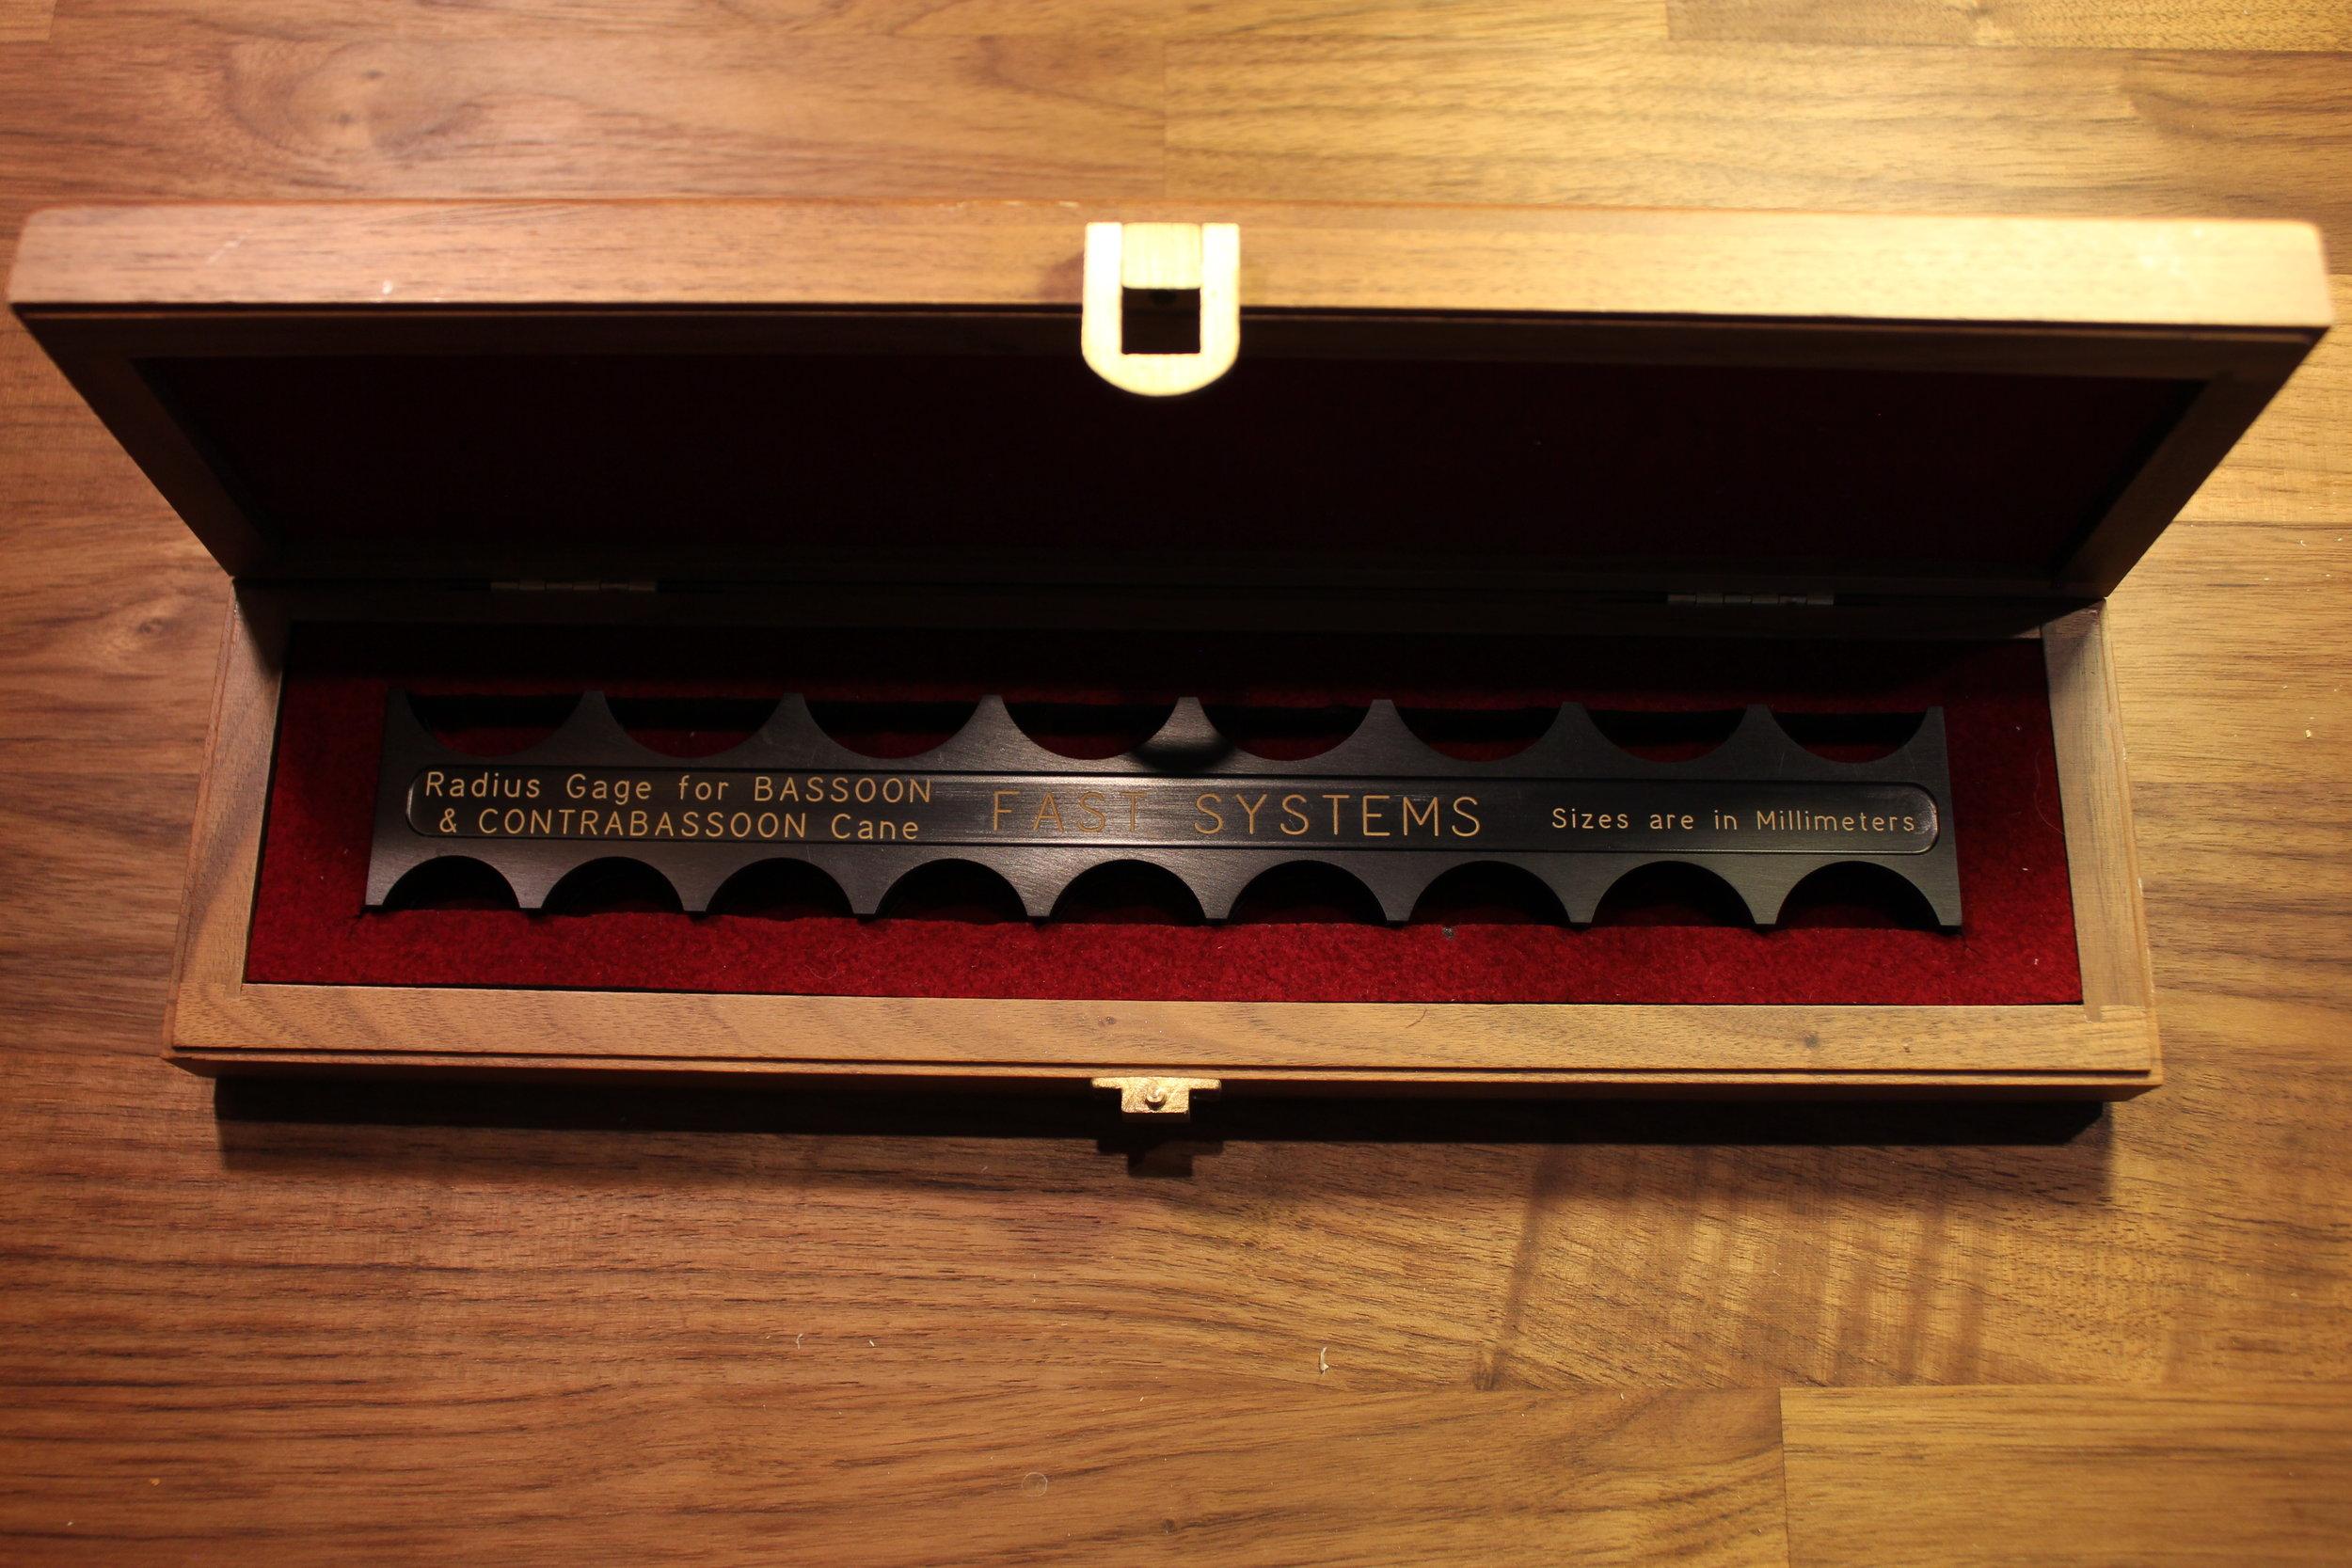 Radius Gauge - Fast Systems (Arlen Fast, NY Philharmonic)